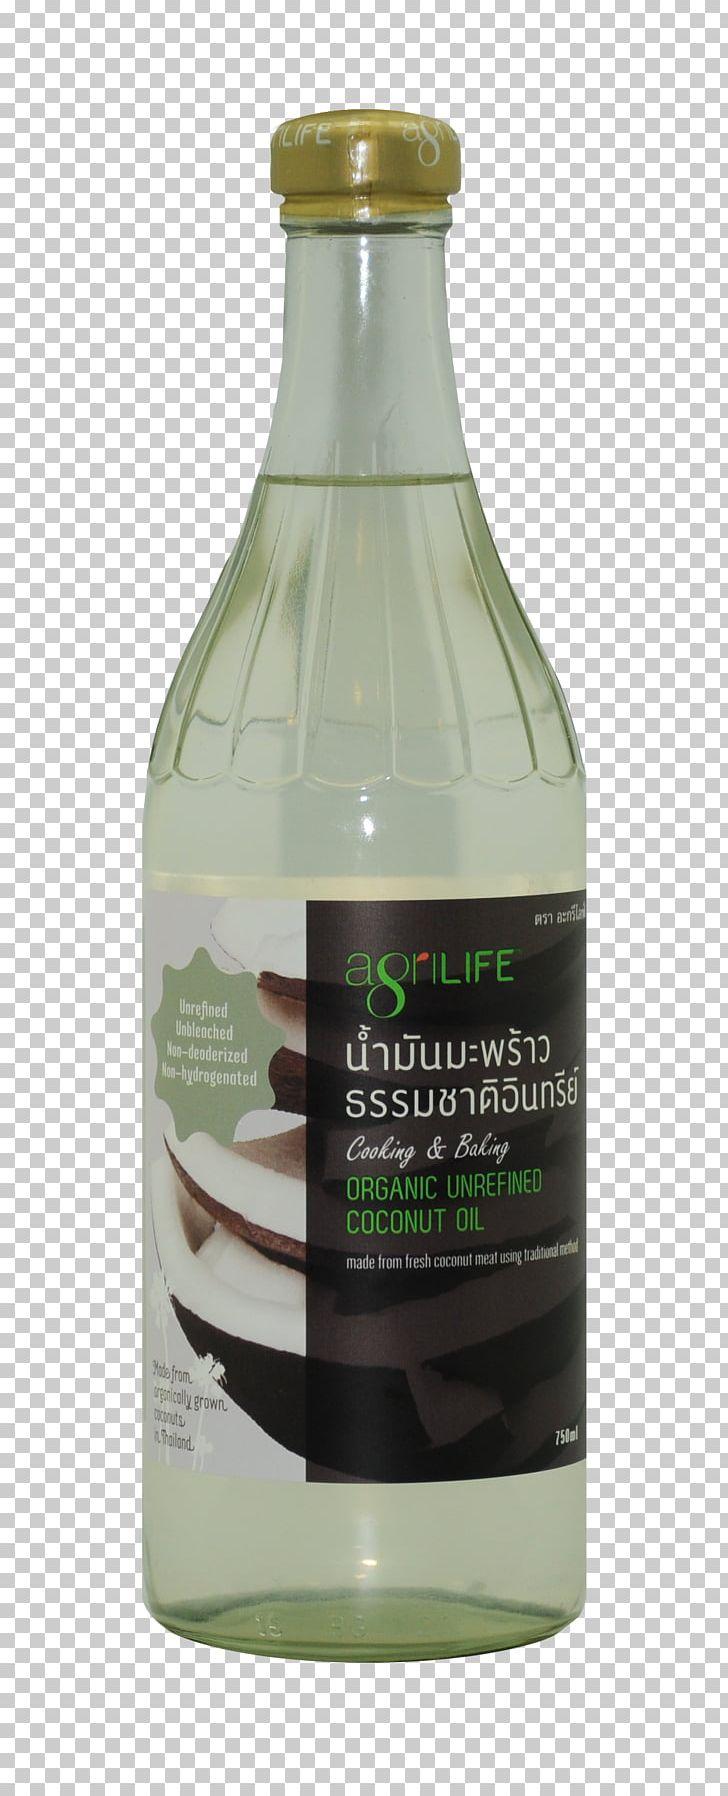 Spectrum Organic Unrefined Coconut Oil Cooking Oils PNG